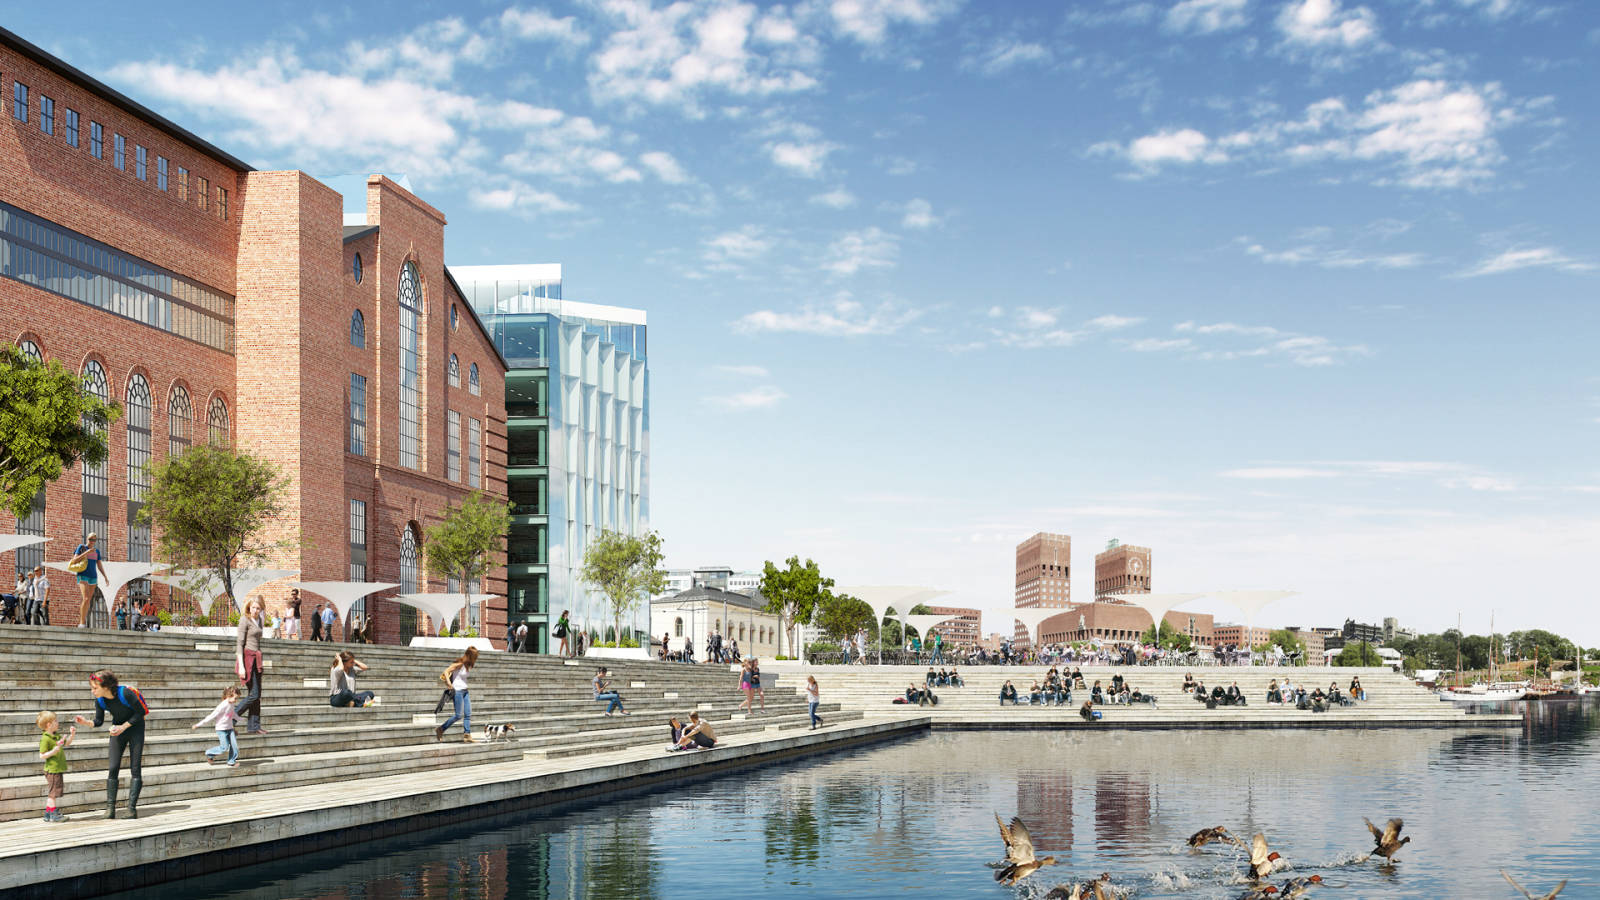 FREE WATERFRONT - Aker Brygge Masterplan - SPOL Architects